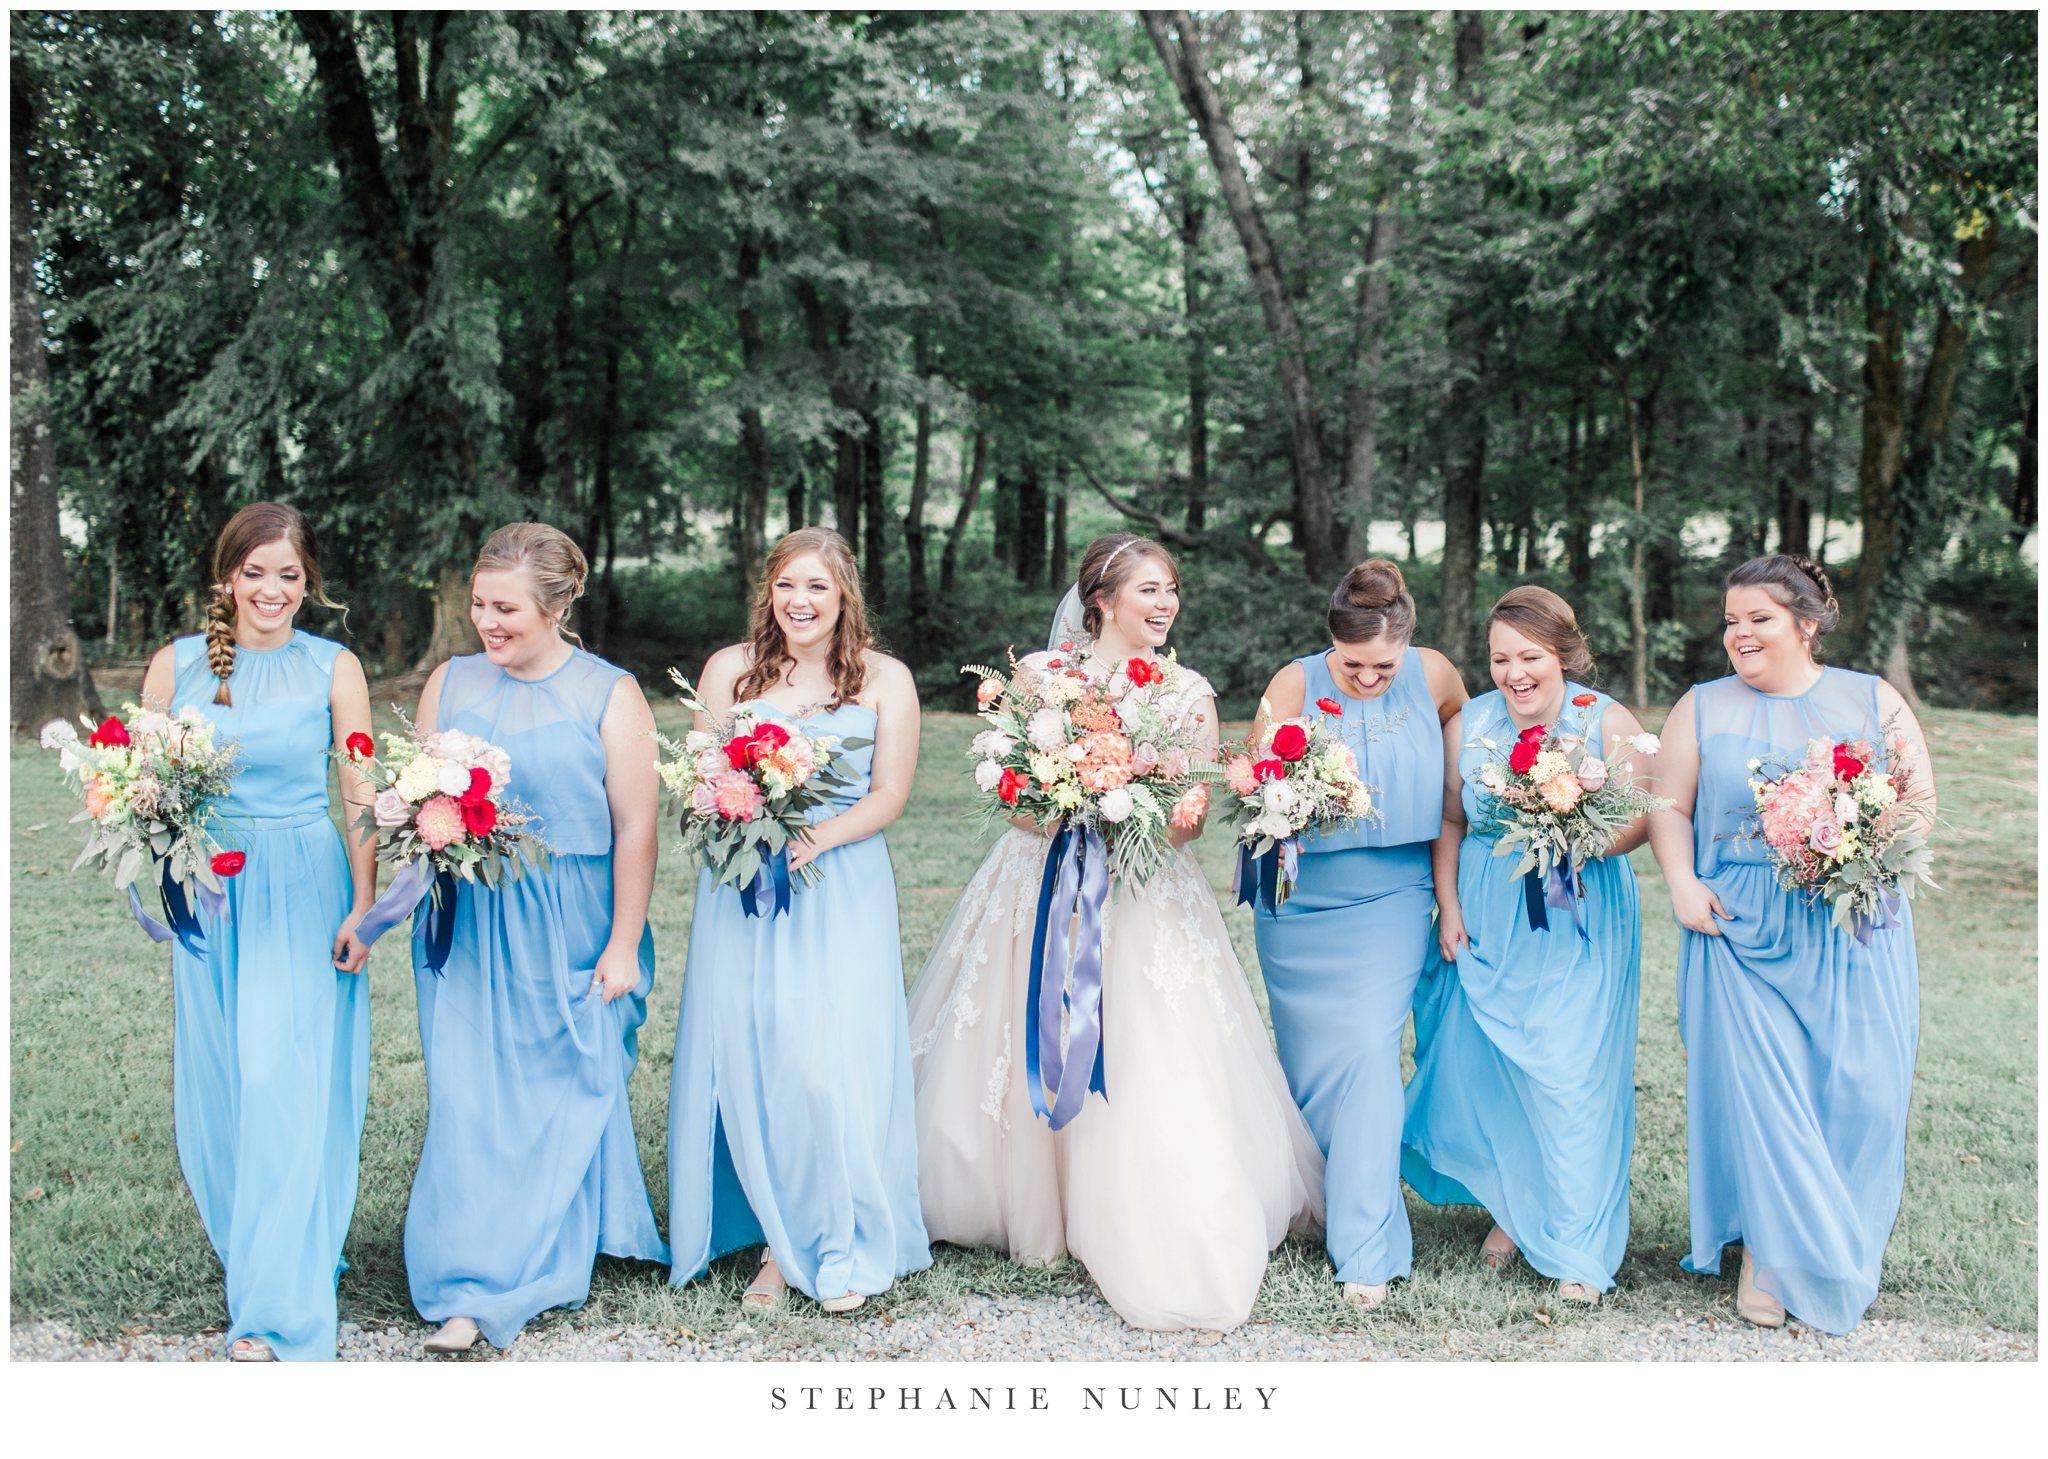 arkansas-wedding-with-lush-wildflower-bouquet-0071.jpg